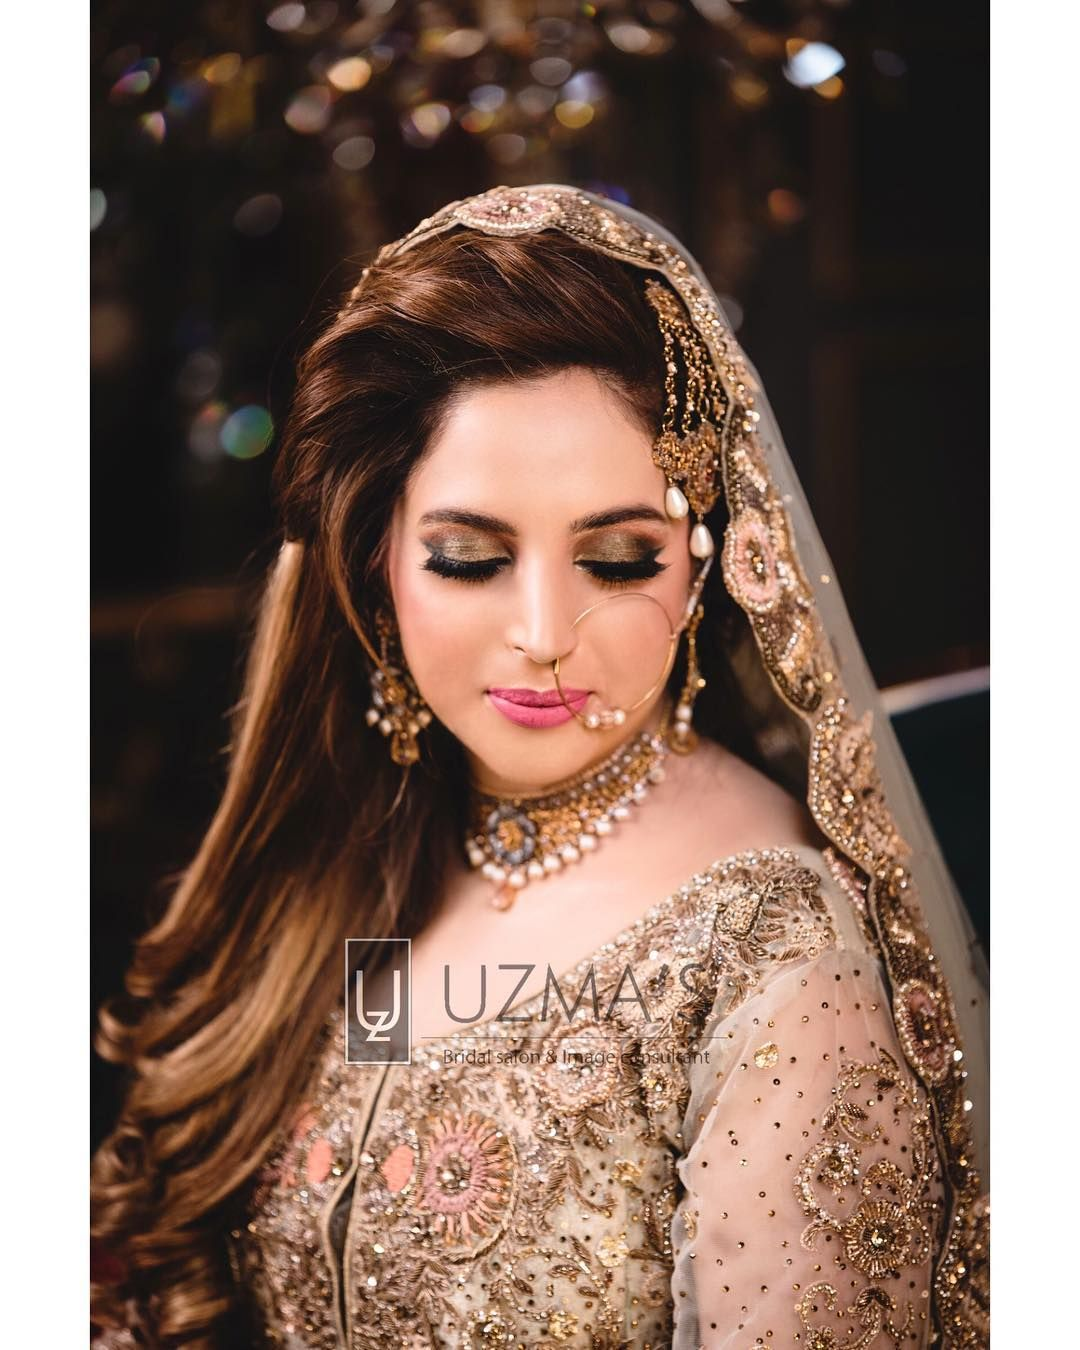 pakistani brides giving major bridal hairstyle goals